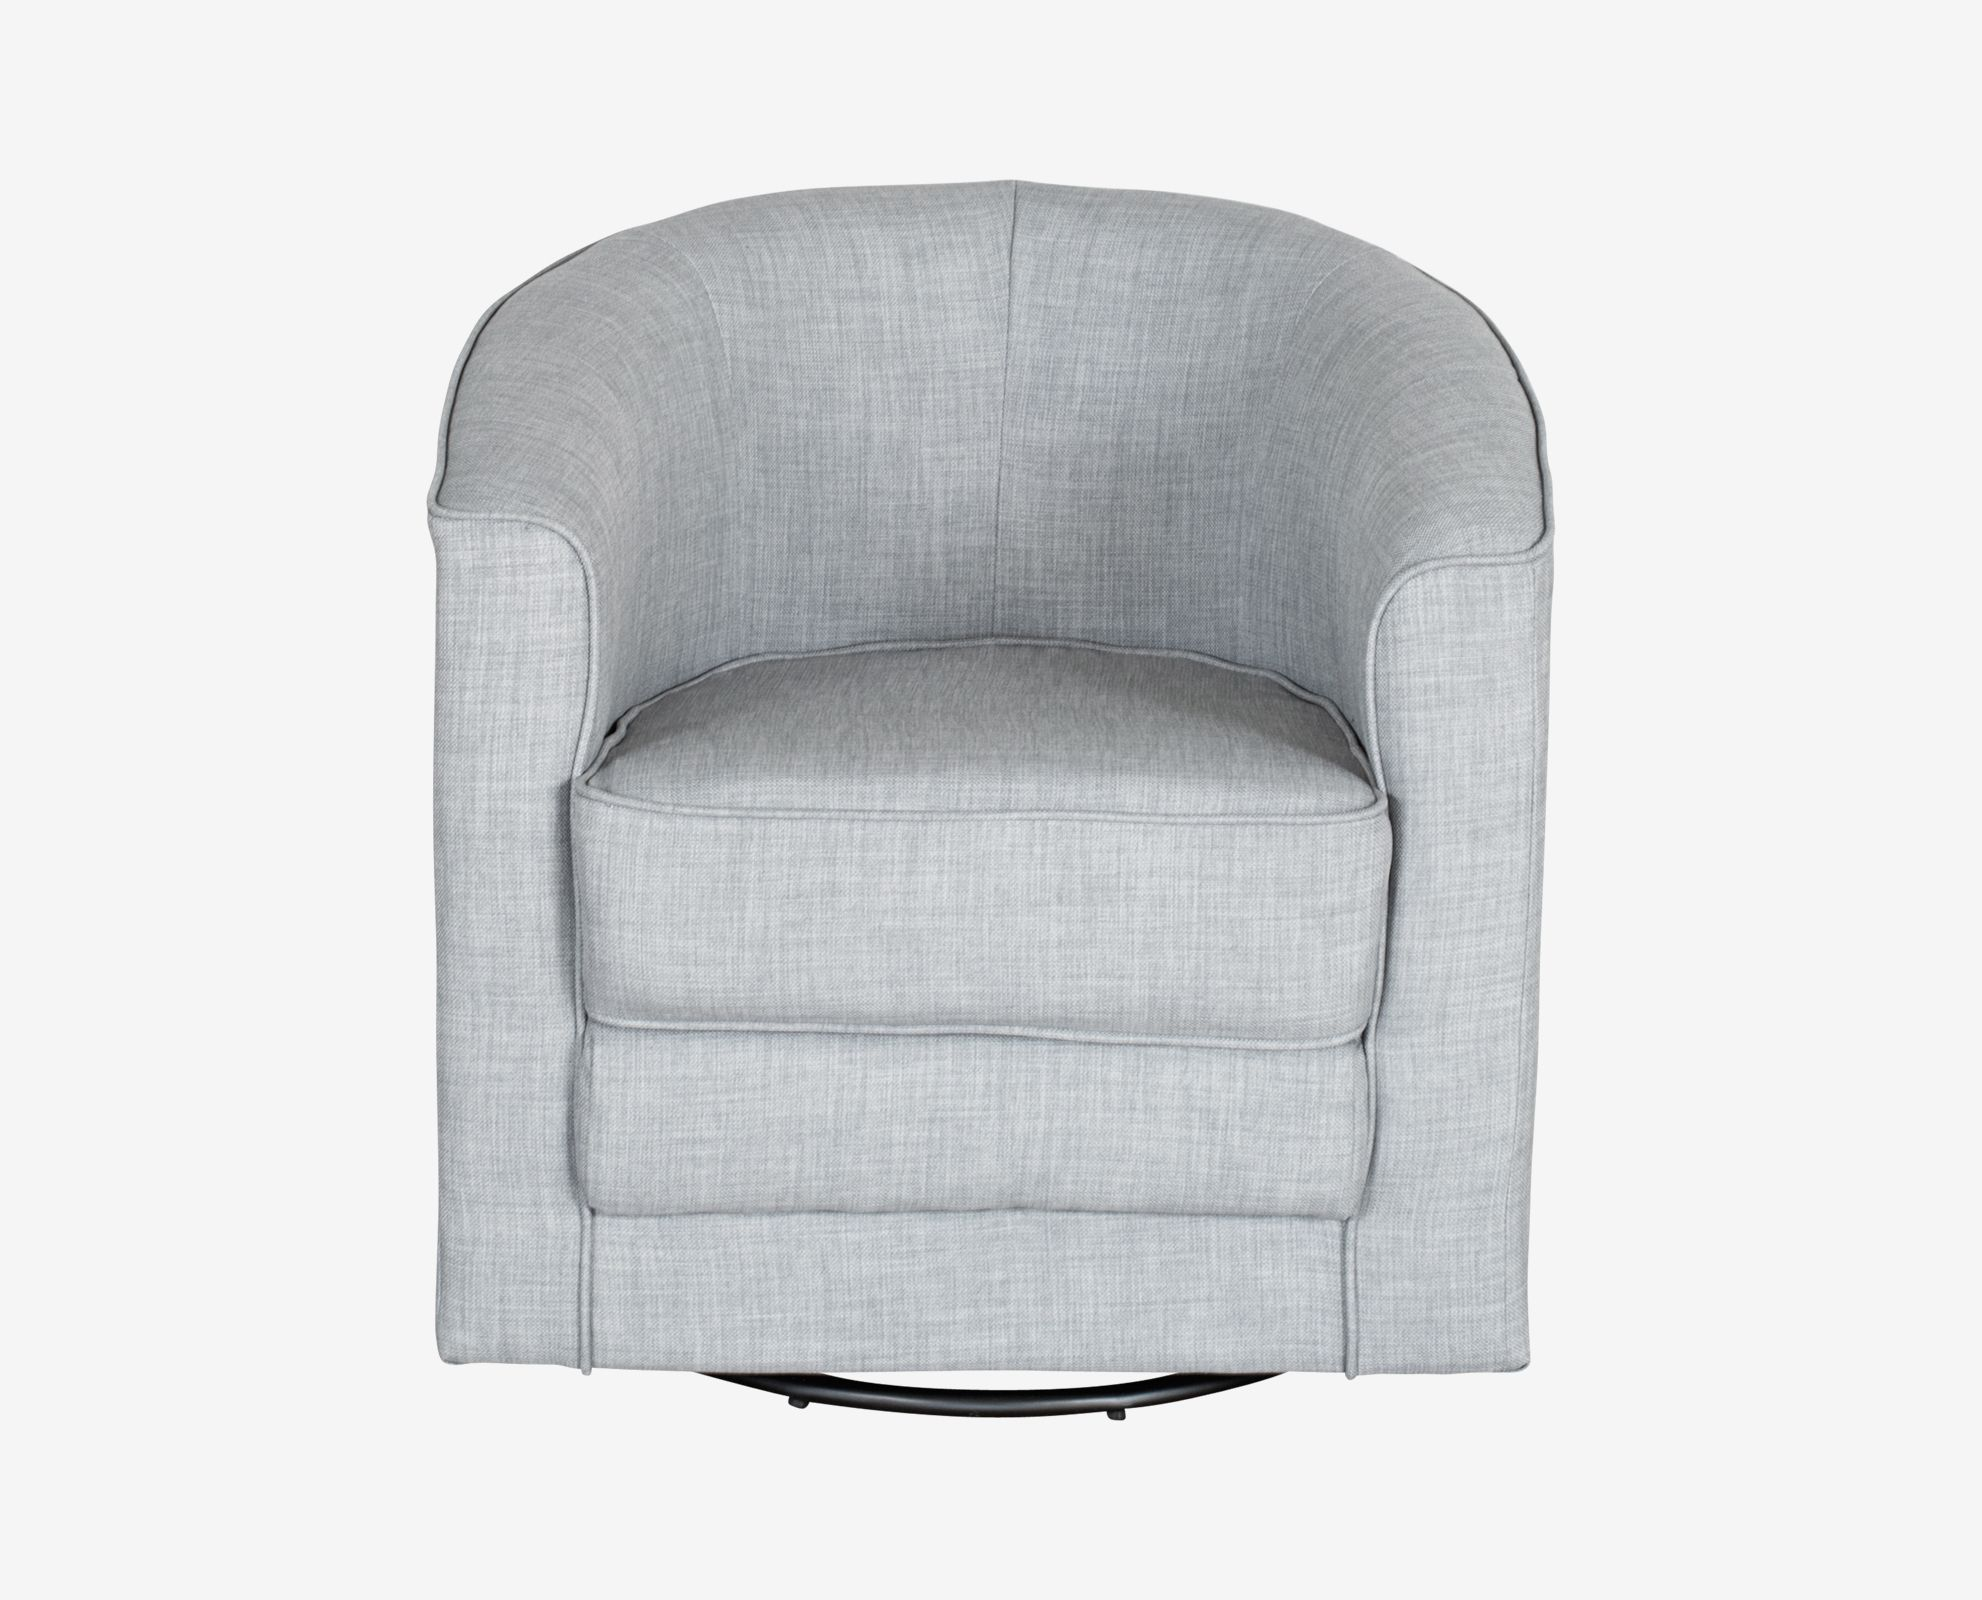 Theva Swivel Chair | HGH | Pinterest | Swivel chair, Living rooms ...